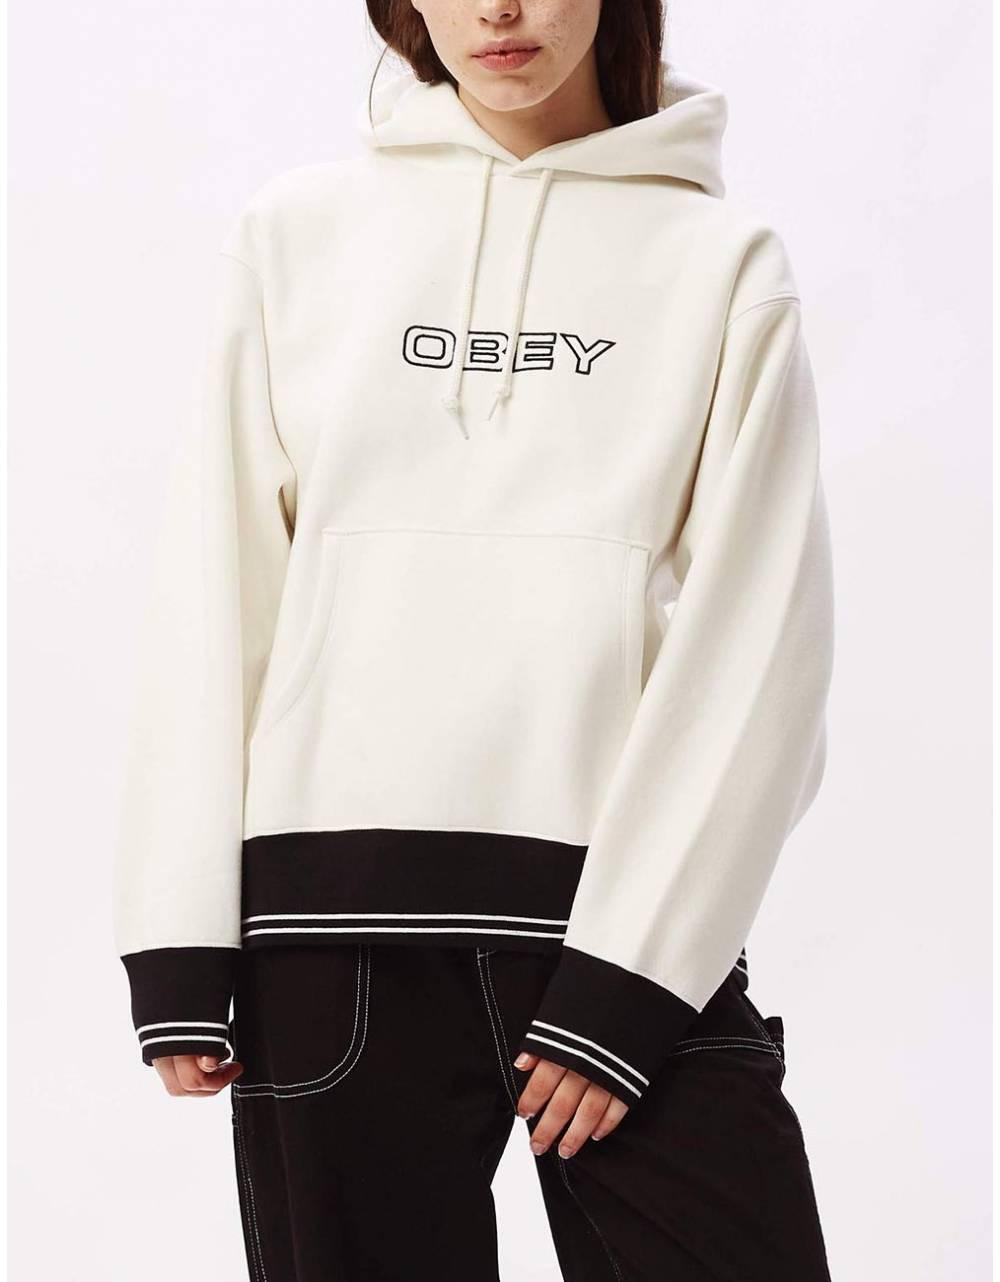 Obey Woman Gordon hoodie - bone obey Sweater 83,61€